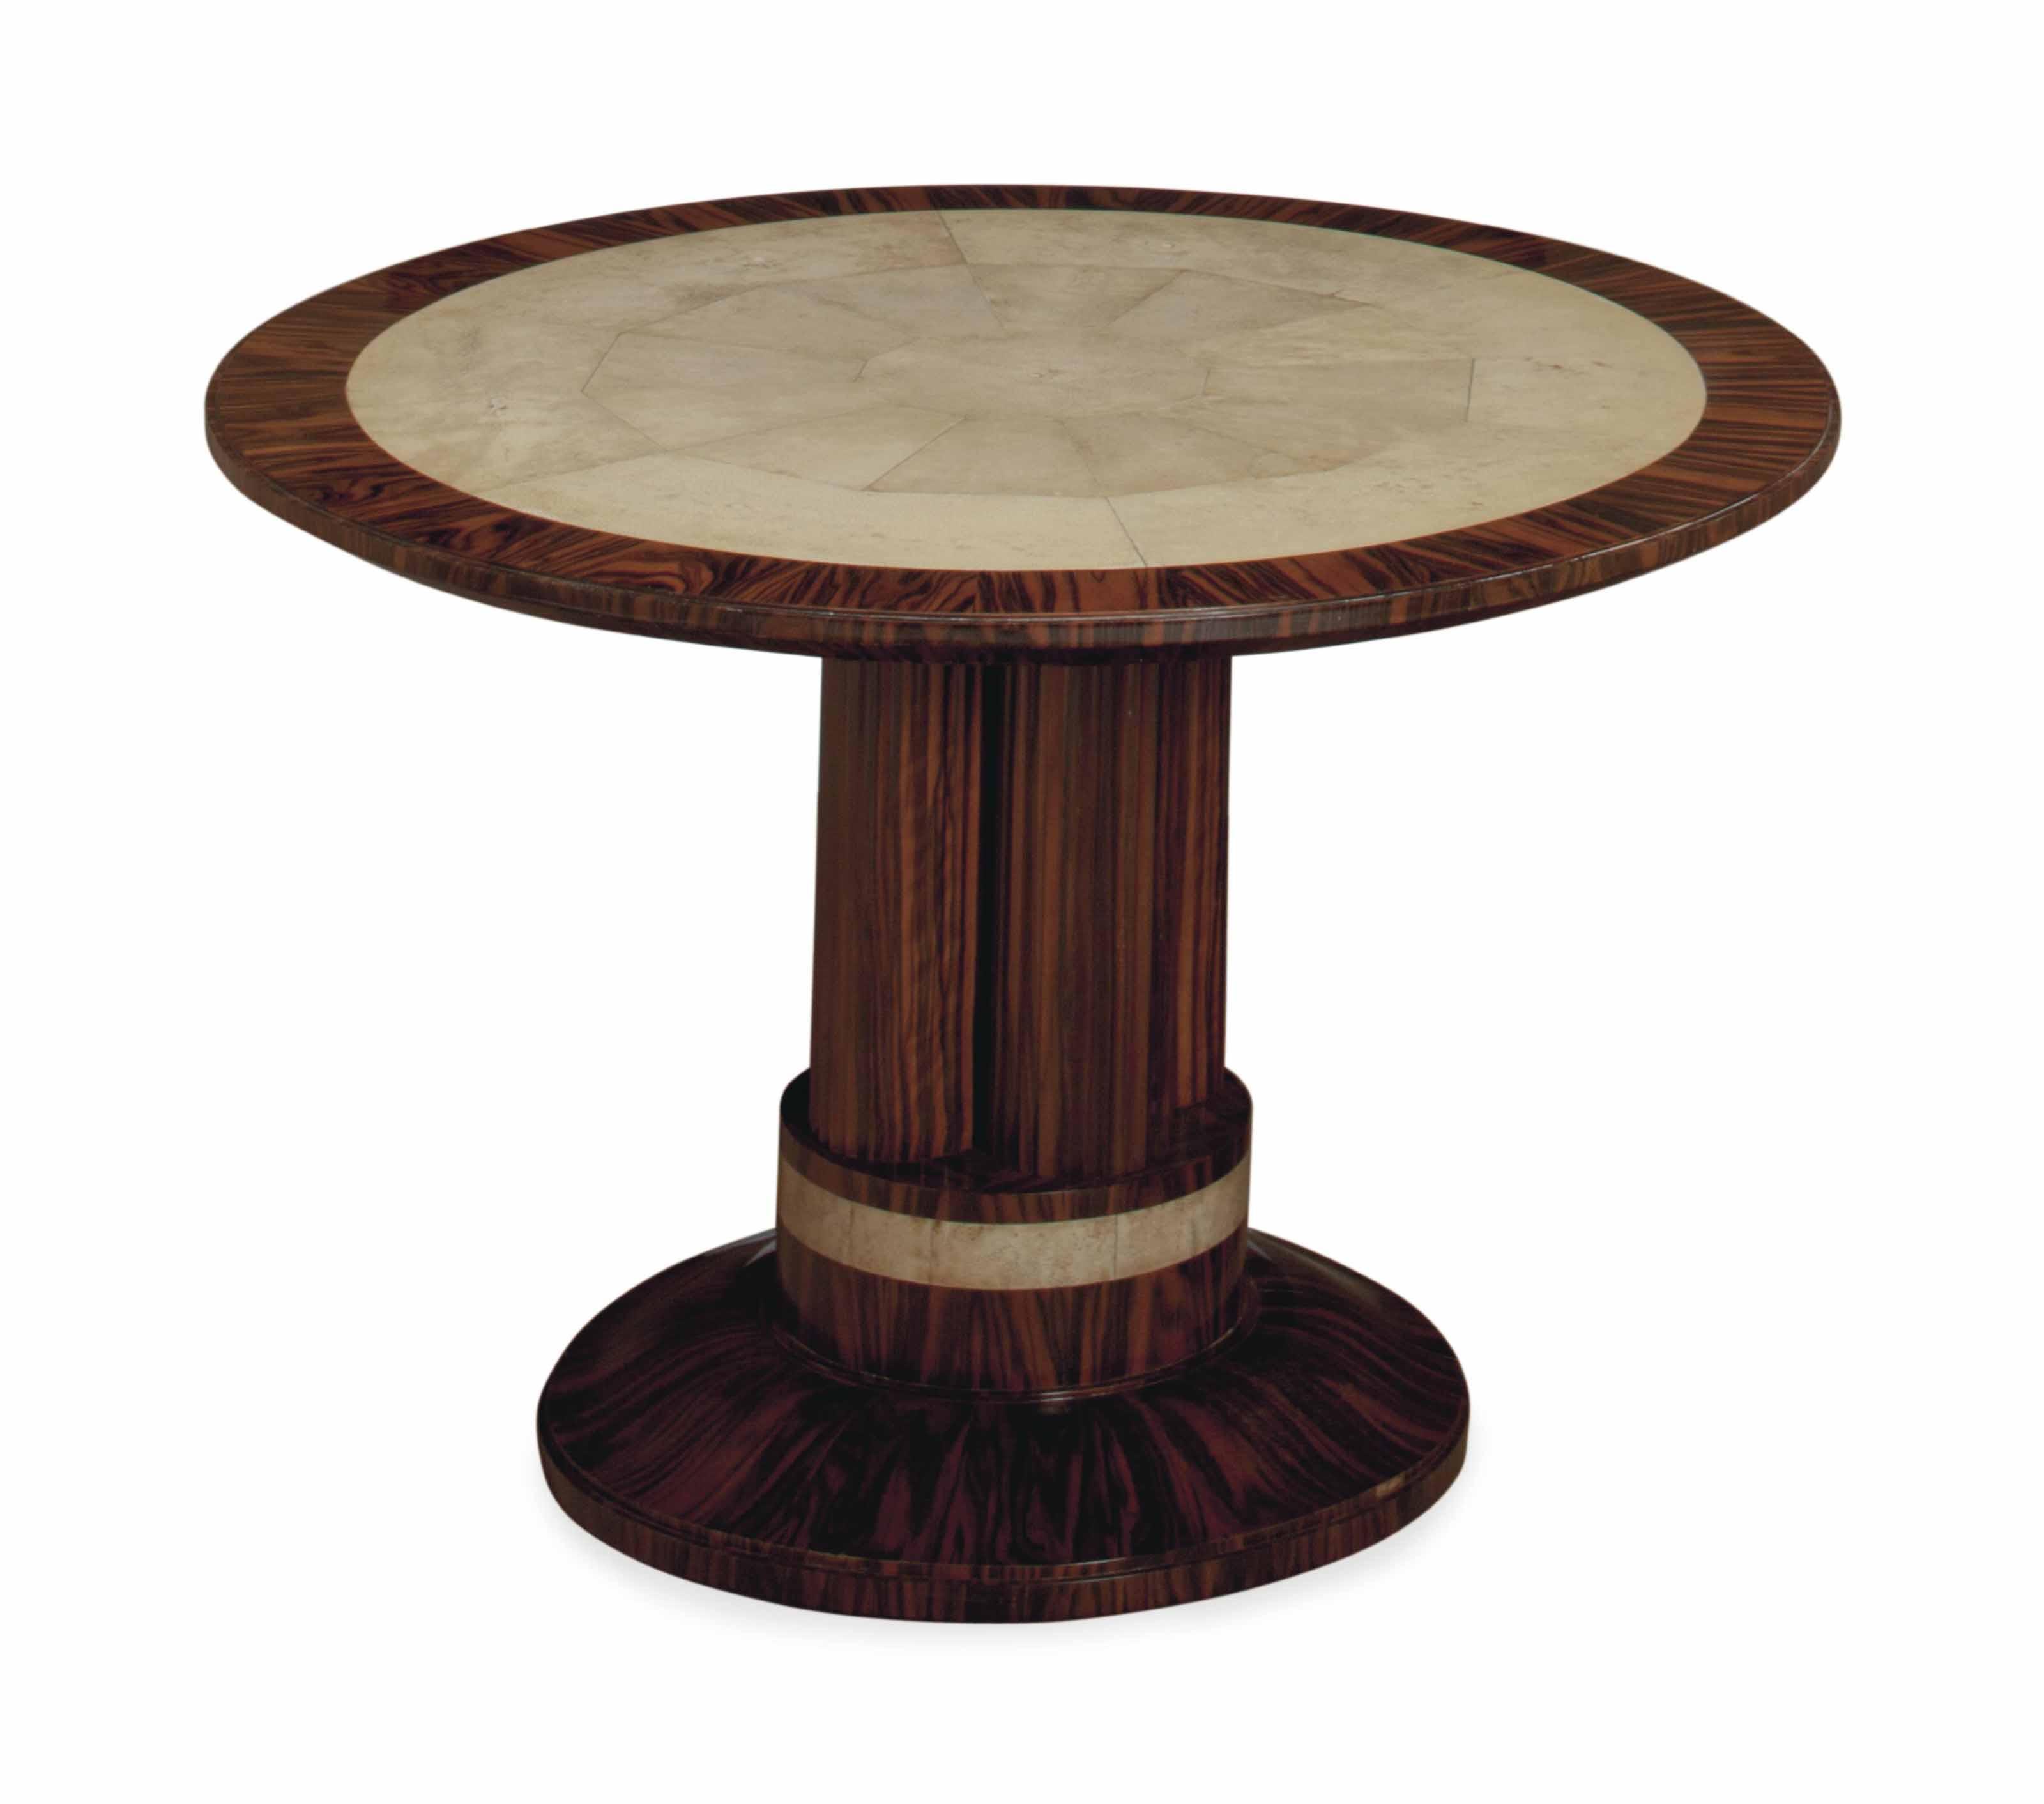 A FRENCH SHAGREEN-MOUNTED CALAMANDER CIRCULAR LOW TABLE,